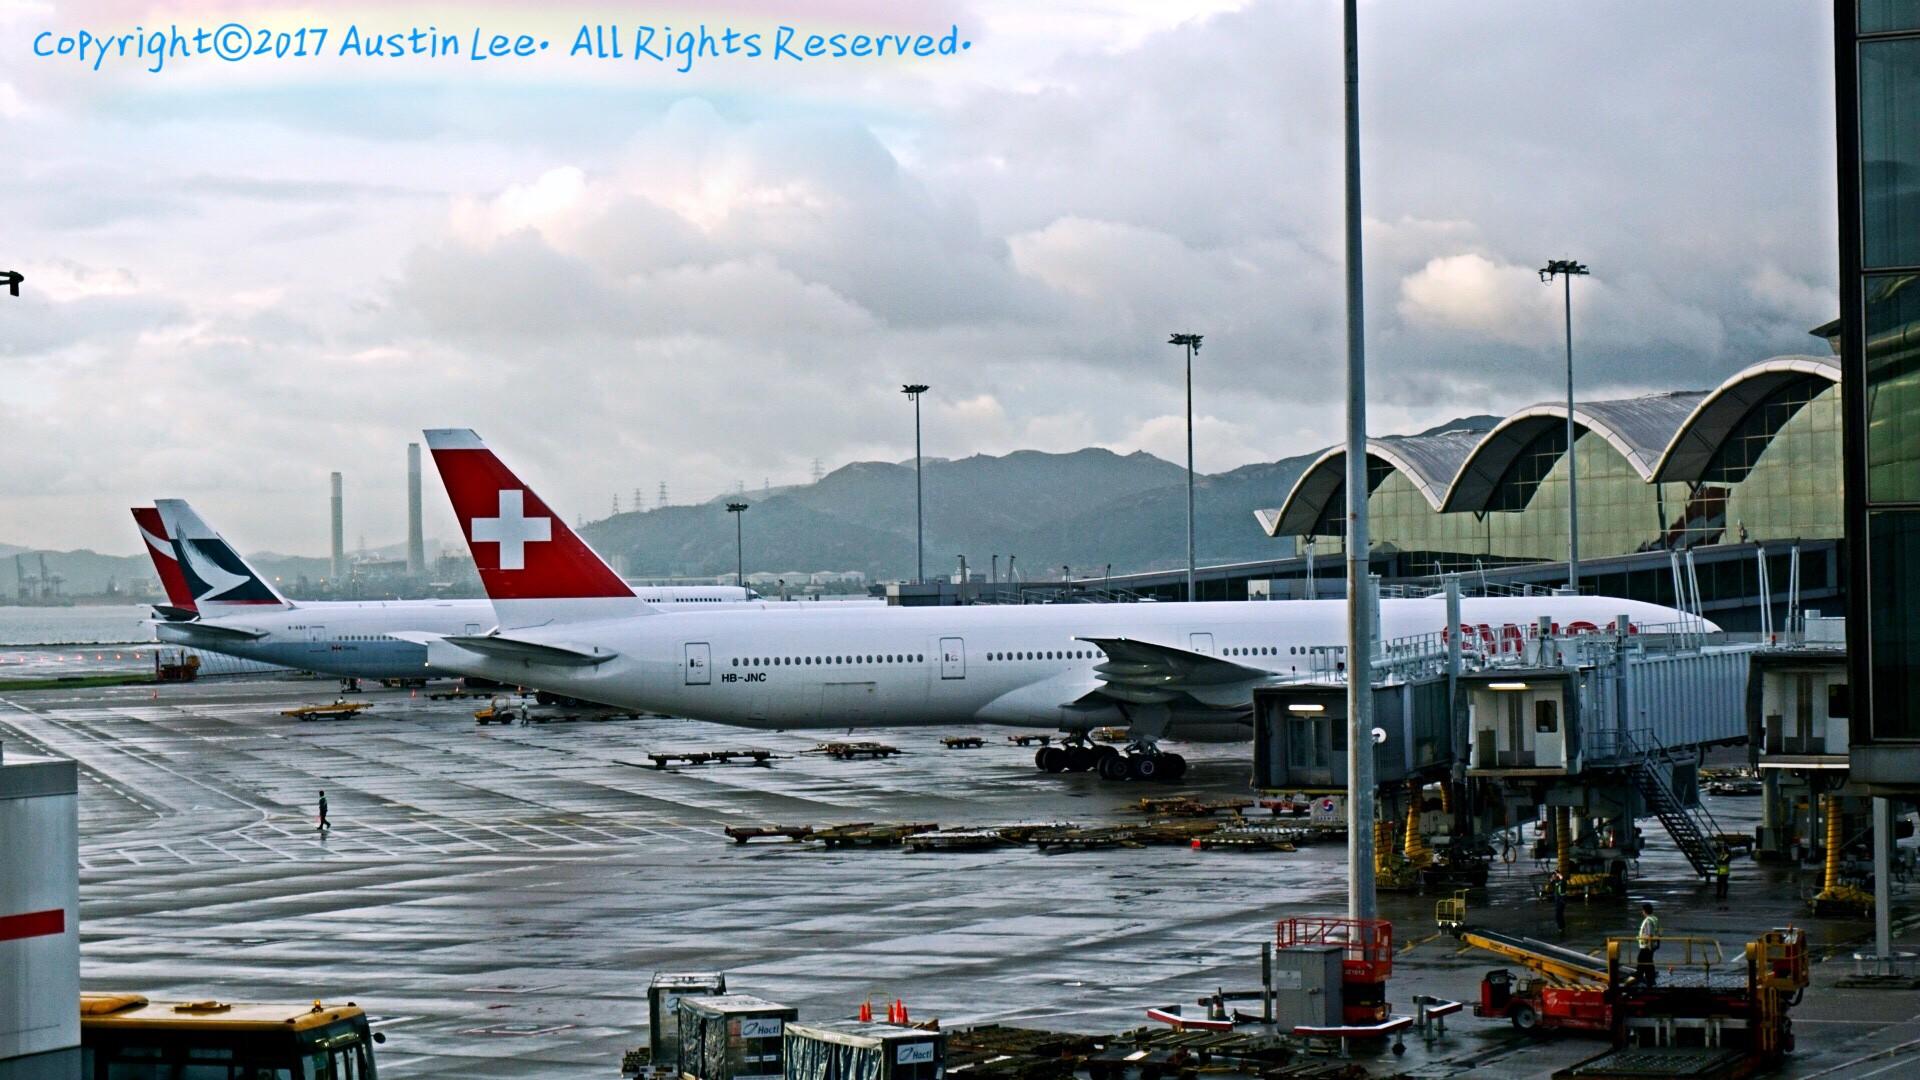 Re:[原创]论坛修复后第一波~旧图新发~都是重型~ BOEING 777-3DE(ER) HB-JNC 中国香港国际机场